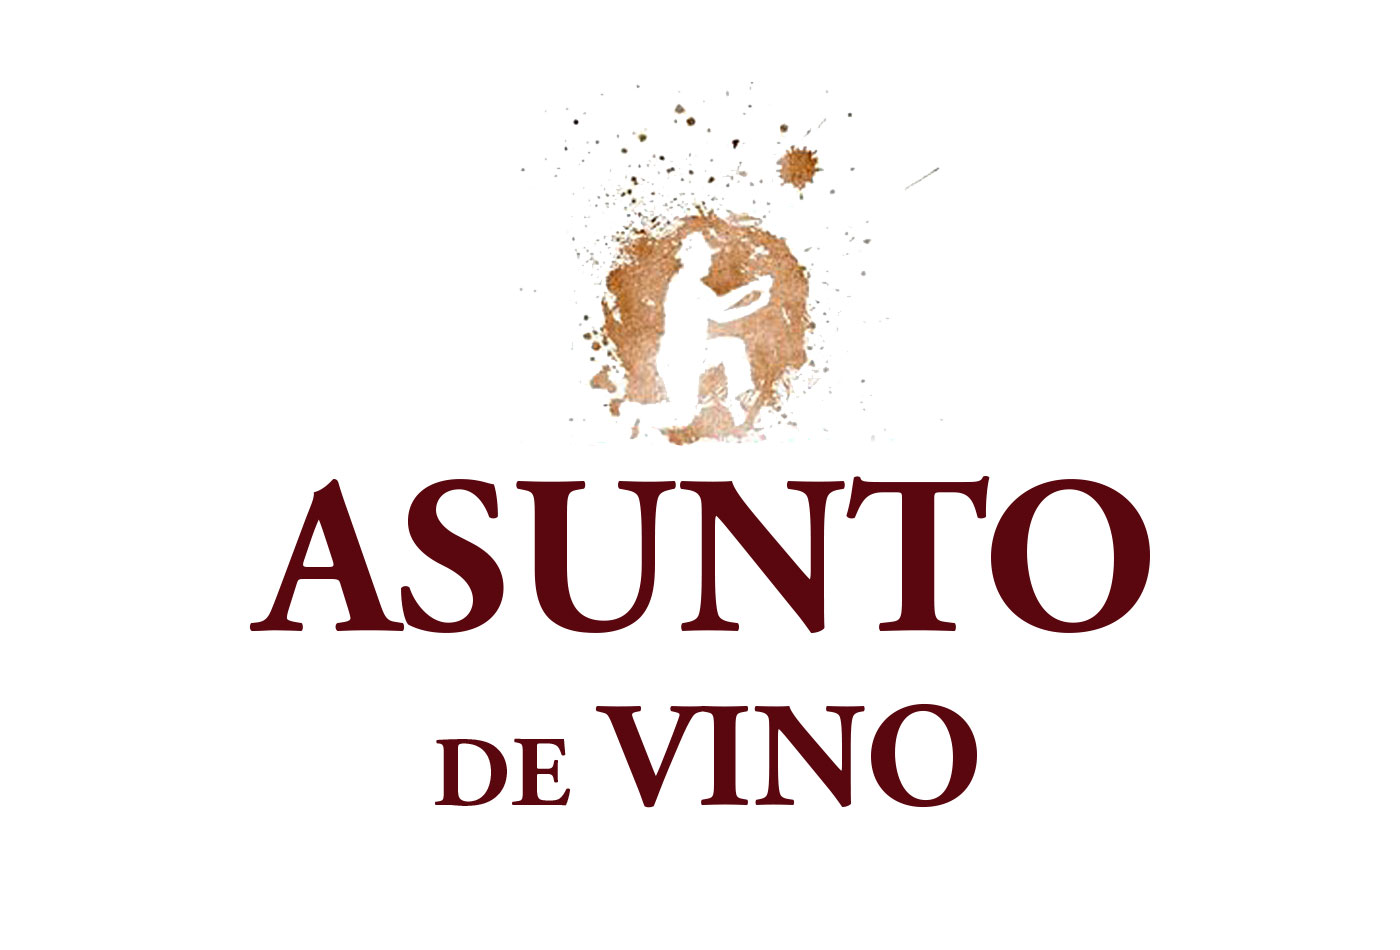 ASUNTO DE VINO